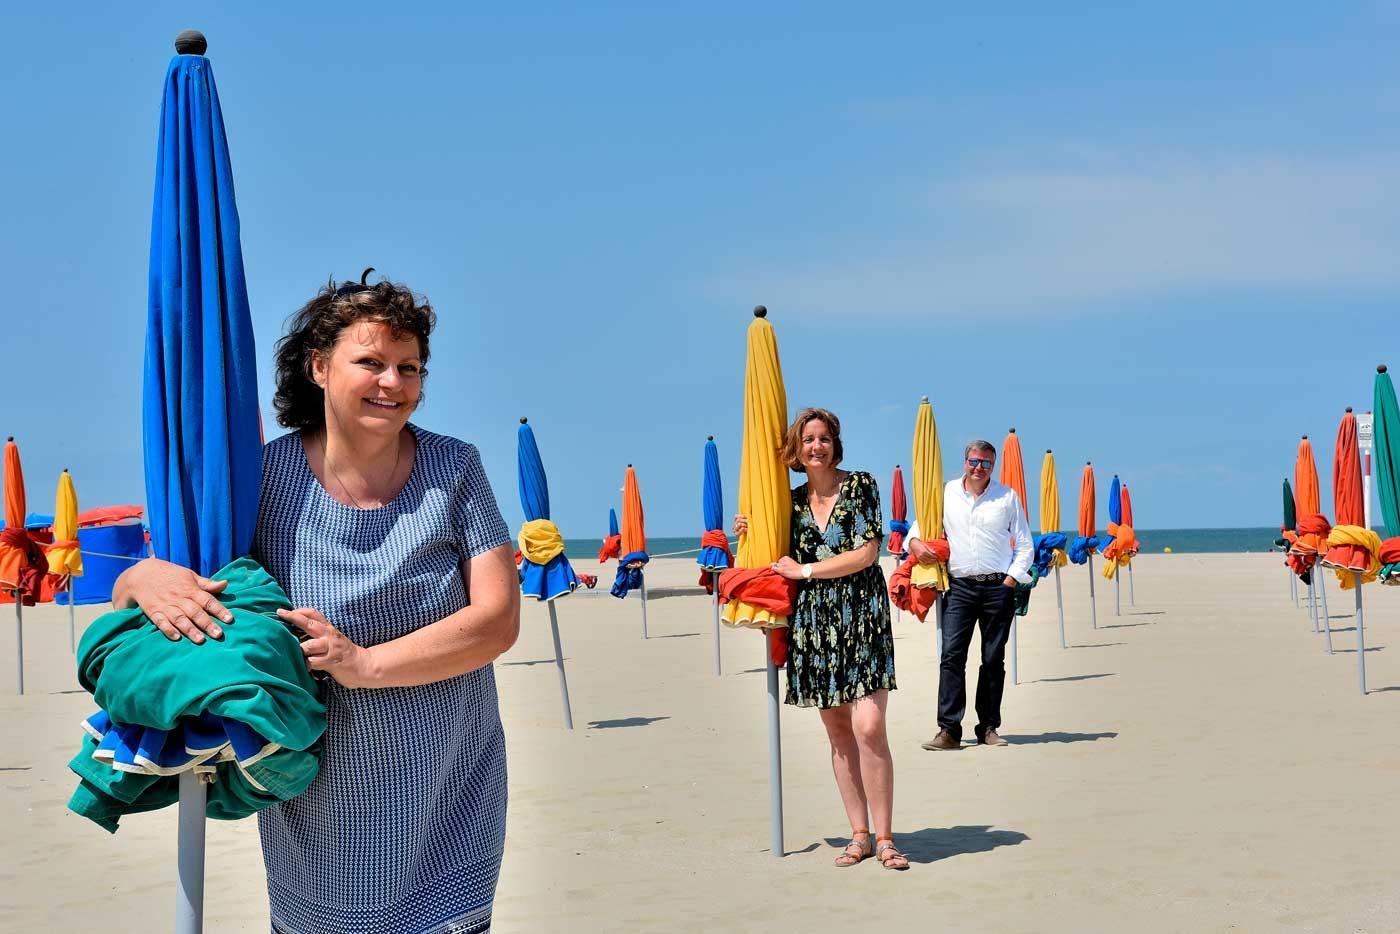 Normandy DMC - Recevoir en Normandie et Forbes